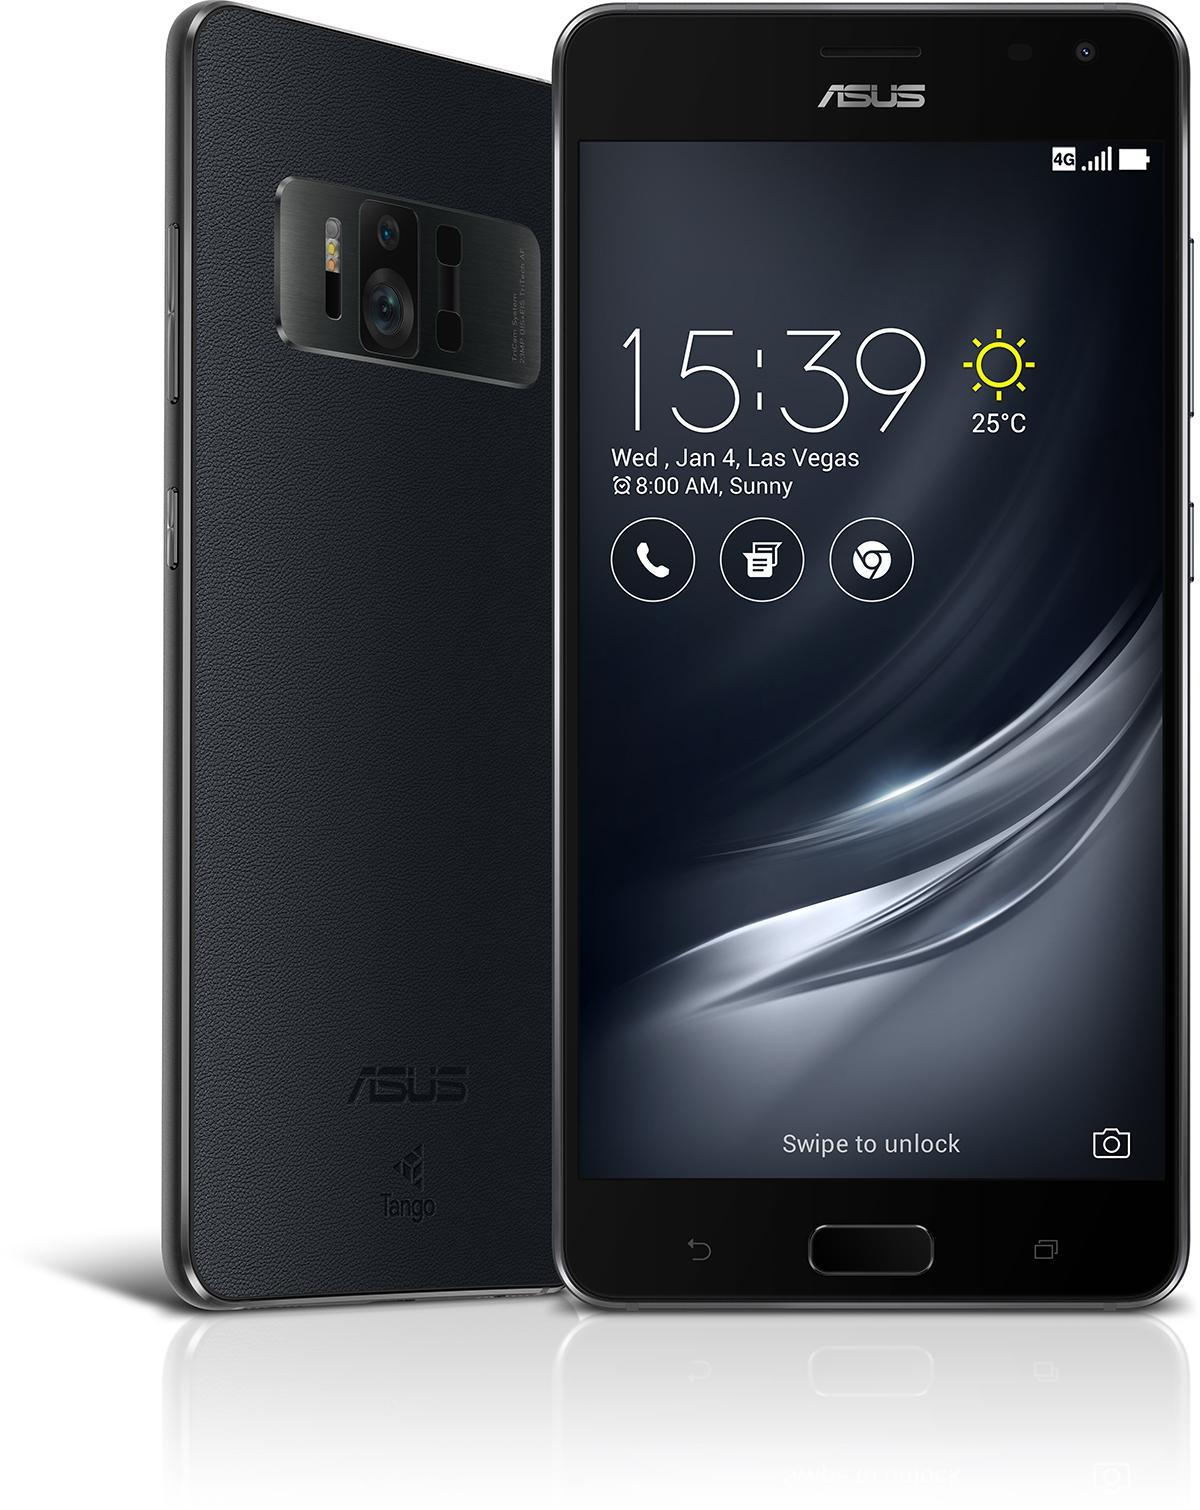 ASUS ZenFone ZS571KL-2A063A Dual SIM 4G 128GB Black smartphone